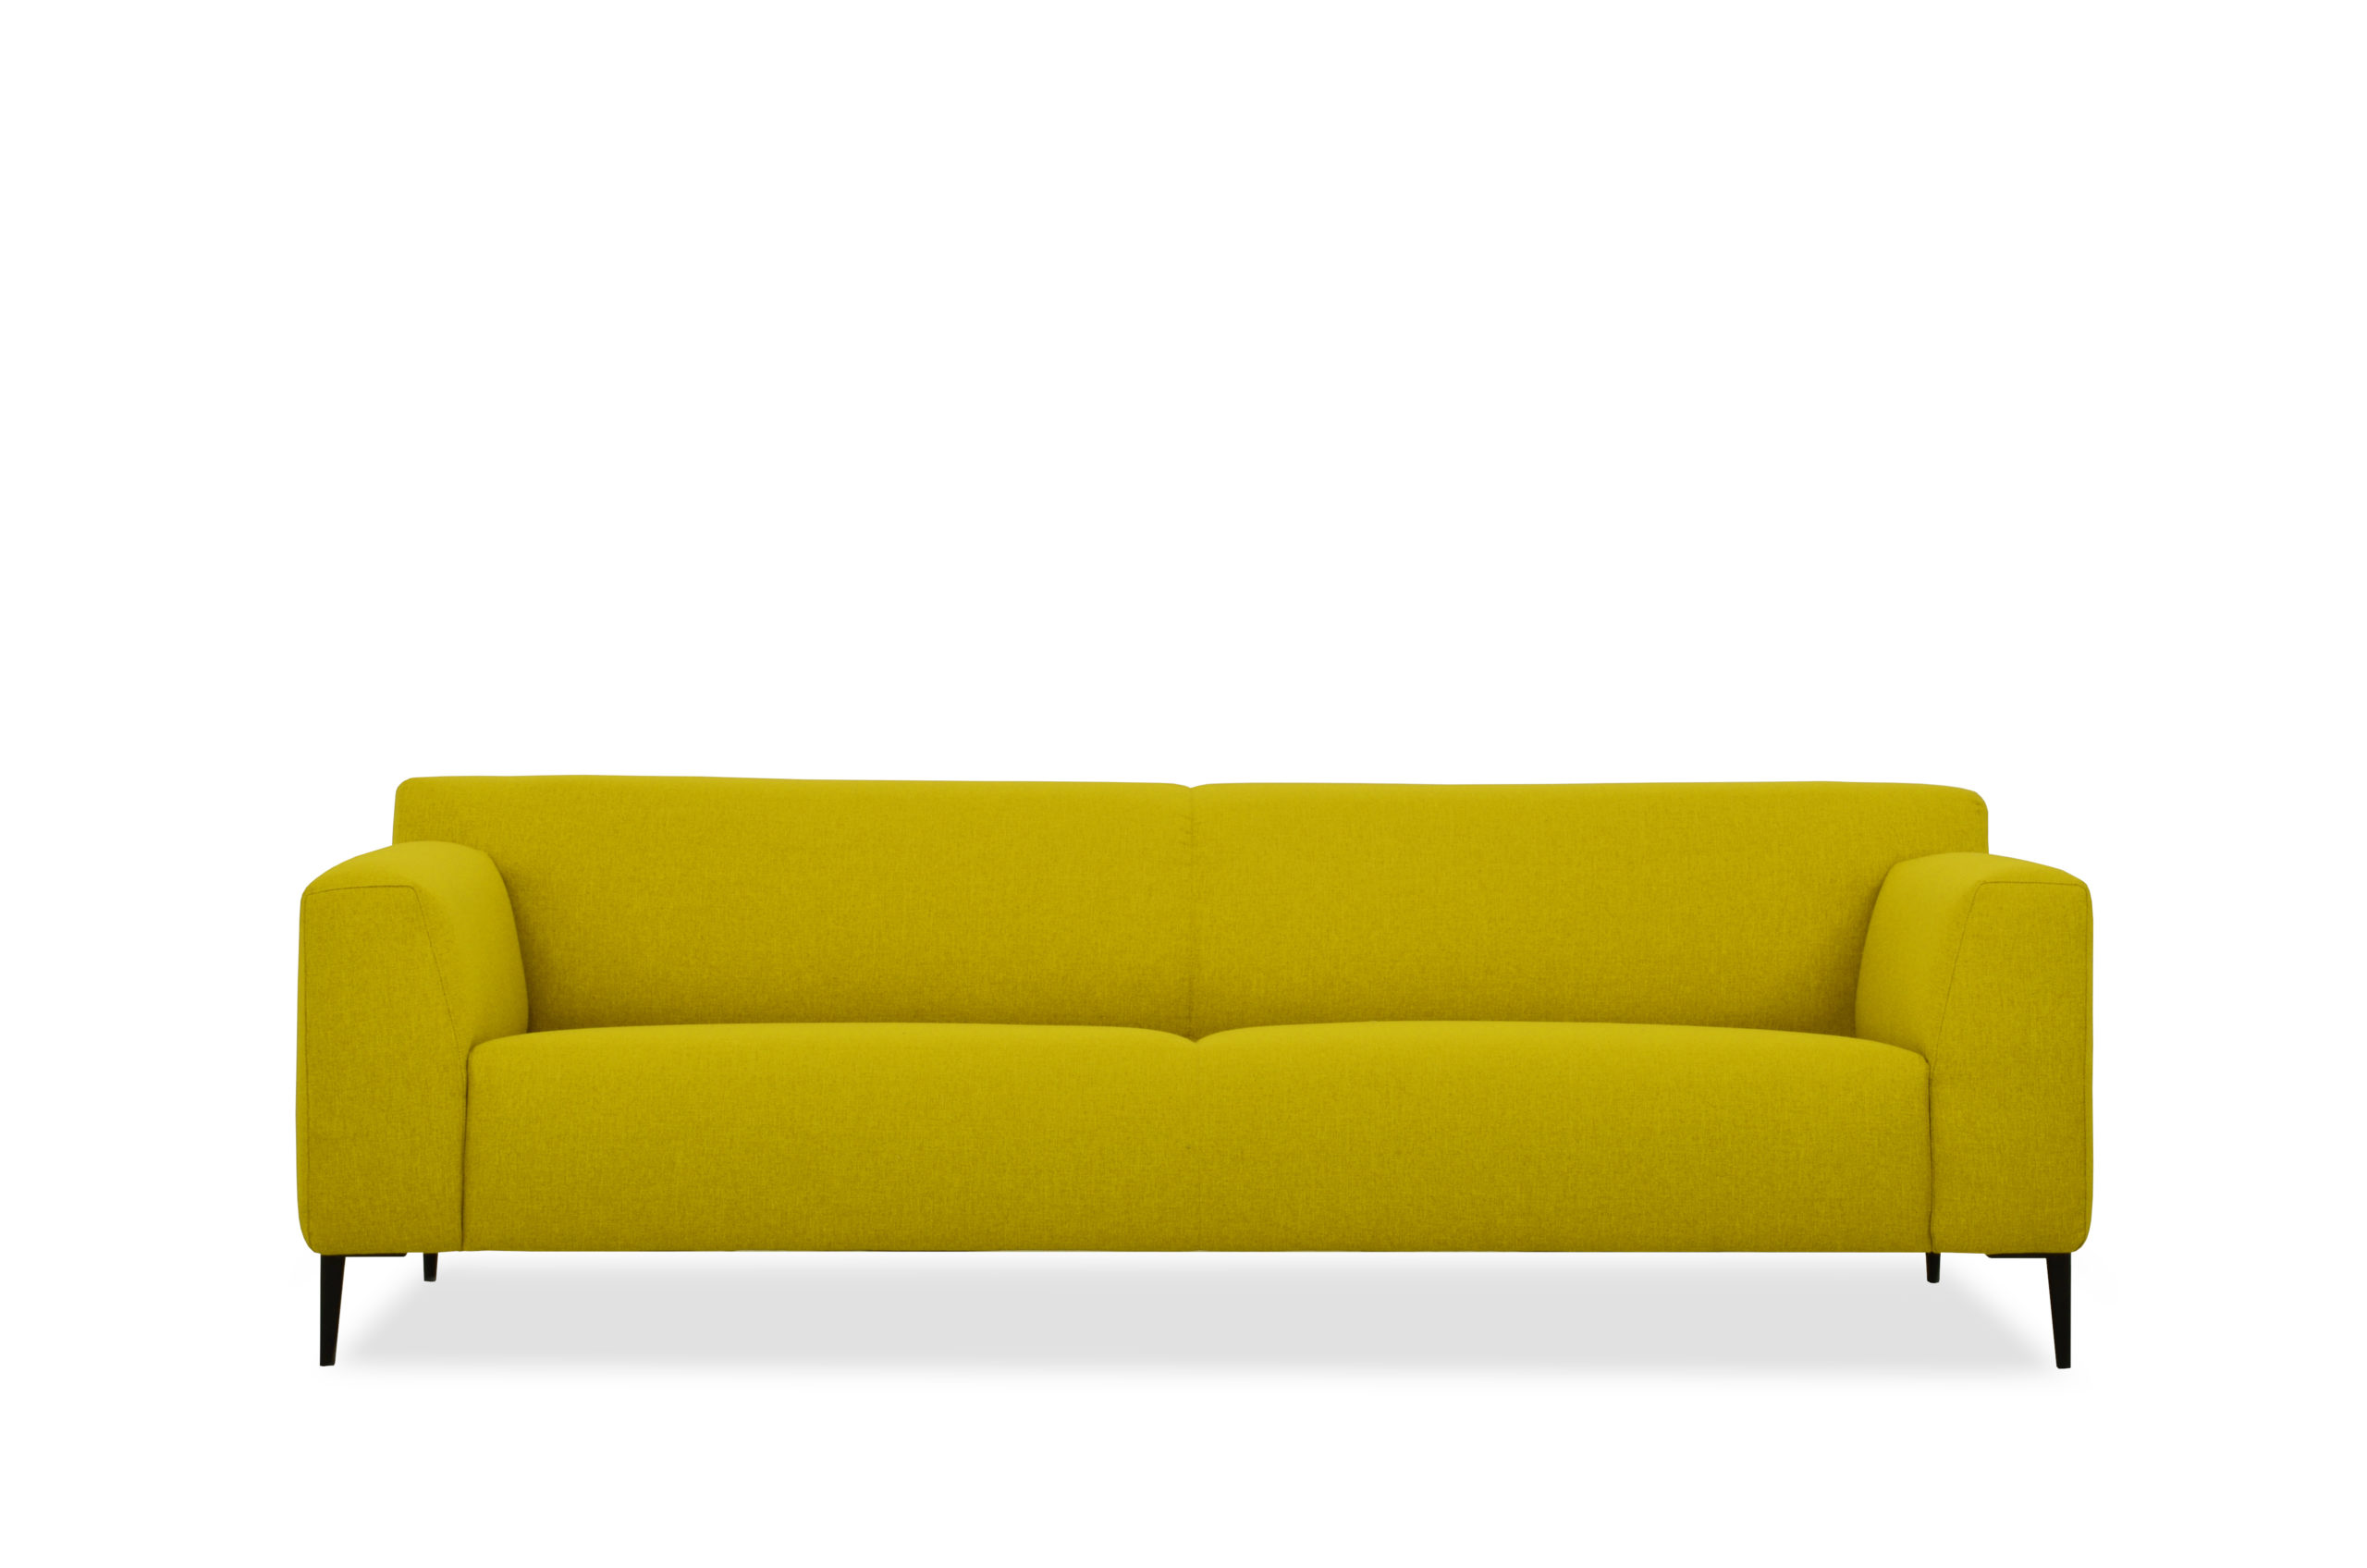 designbank maliesingel fel geel strak model ronde vorm